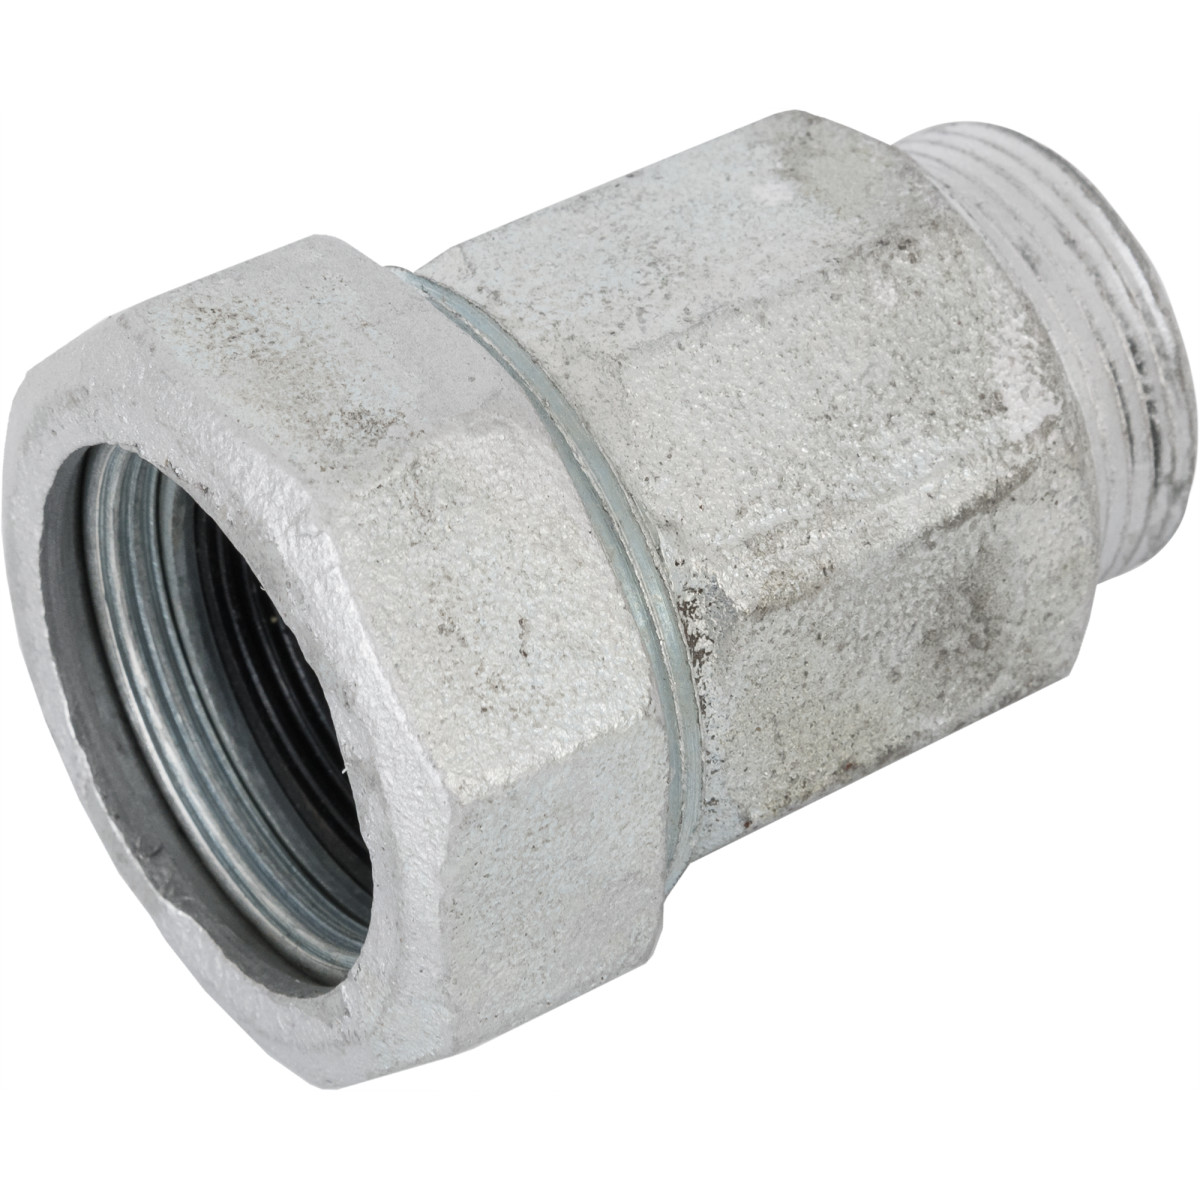 Муфта соединительная наружная резьба 1 1/4 мм